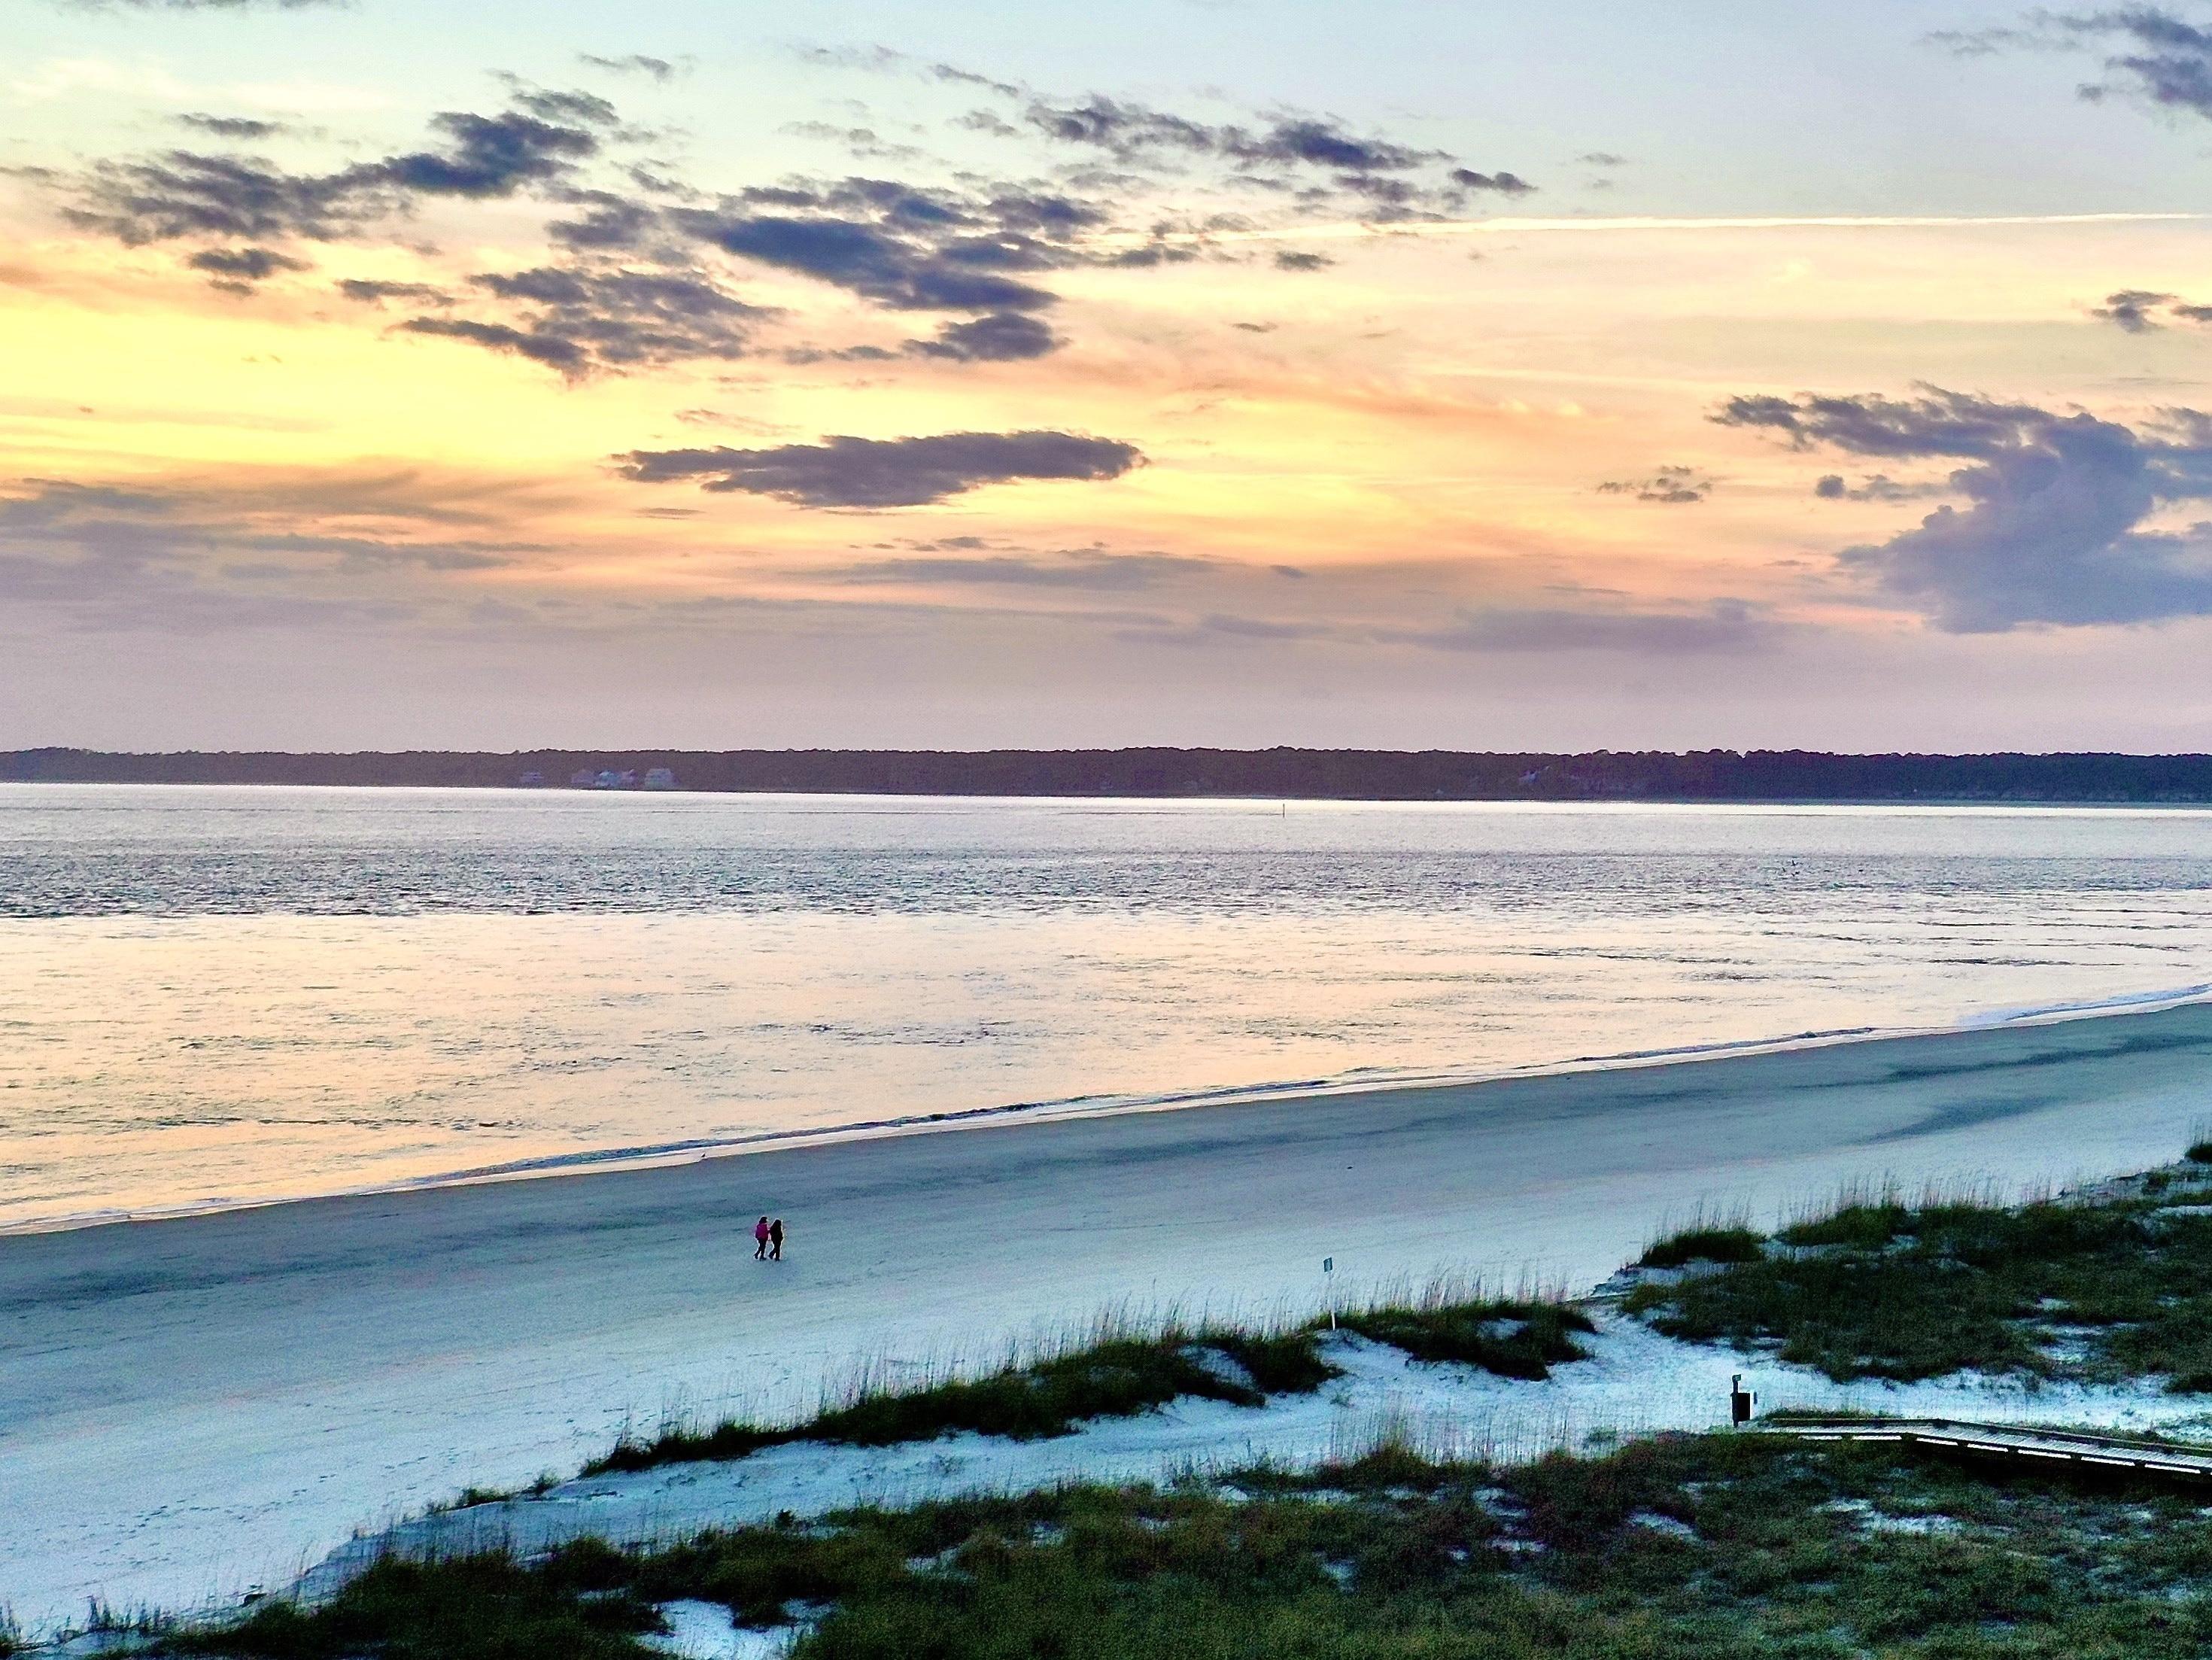 South Beach, Hilton Head Island, Beaufort County, South Carolina, United States of America